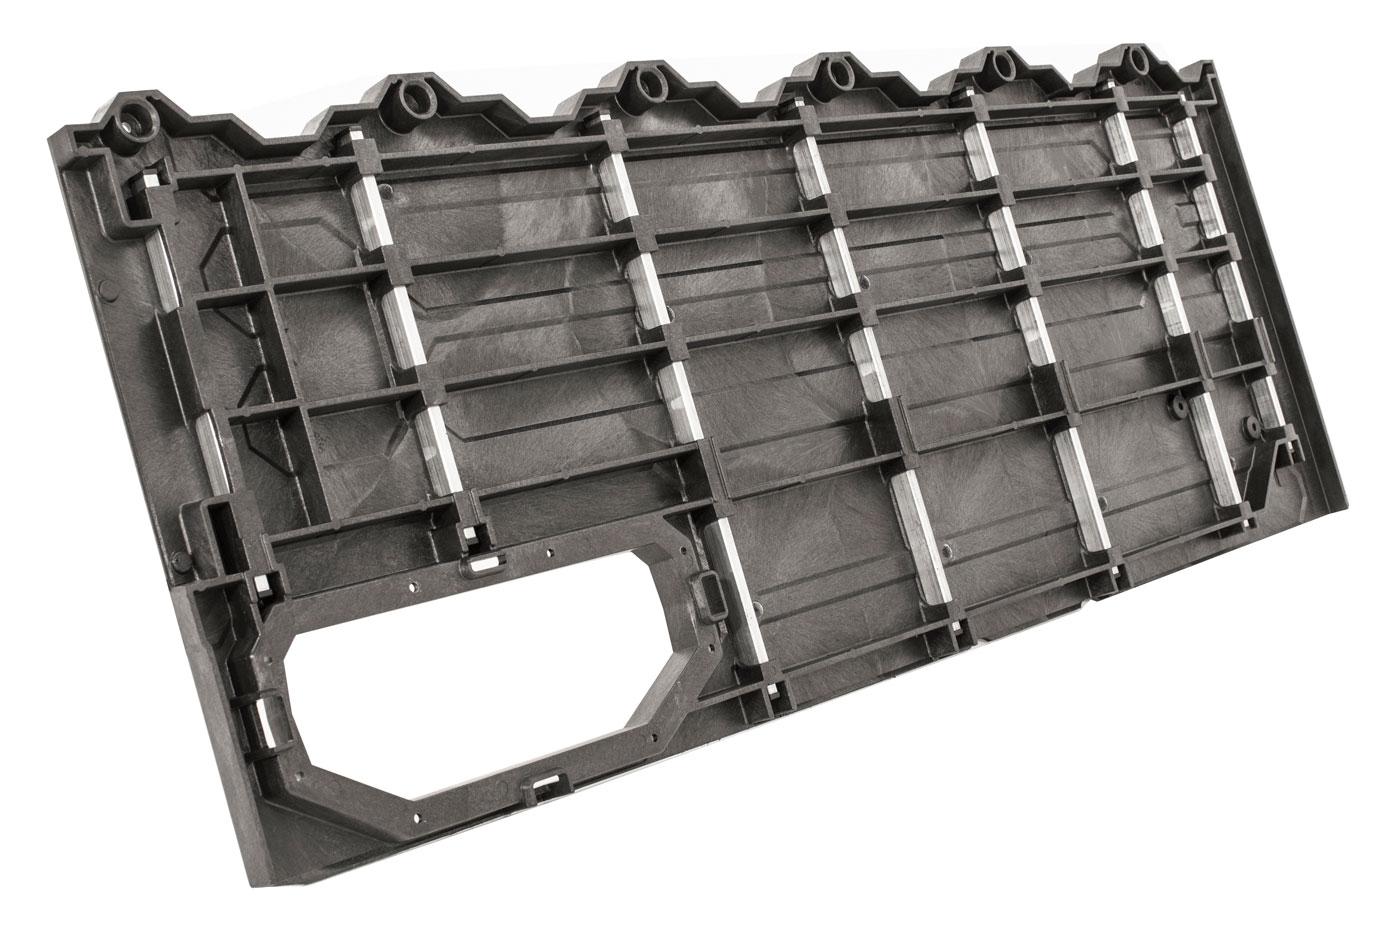 Deck panel back side showing innovative insert molded metal reinforcement rods